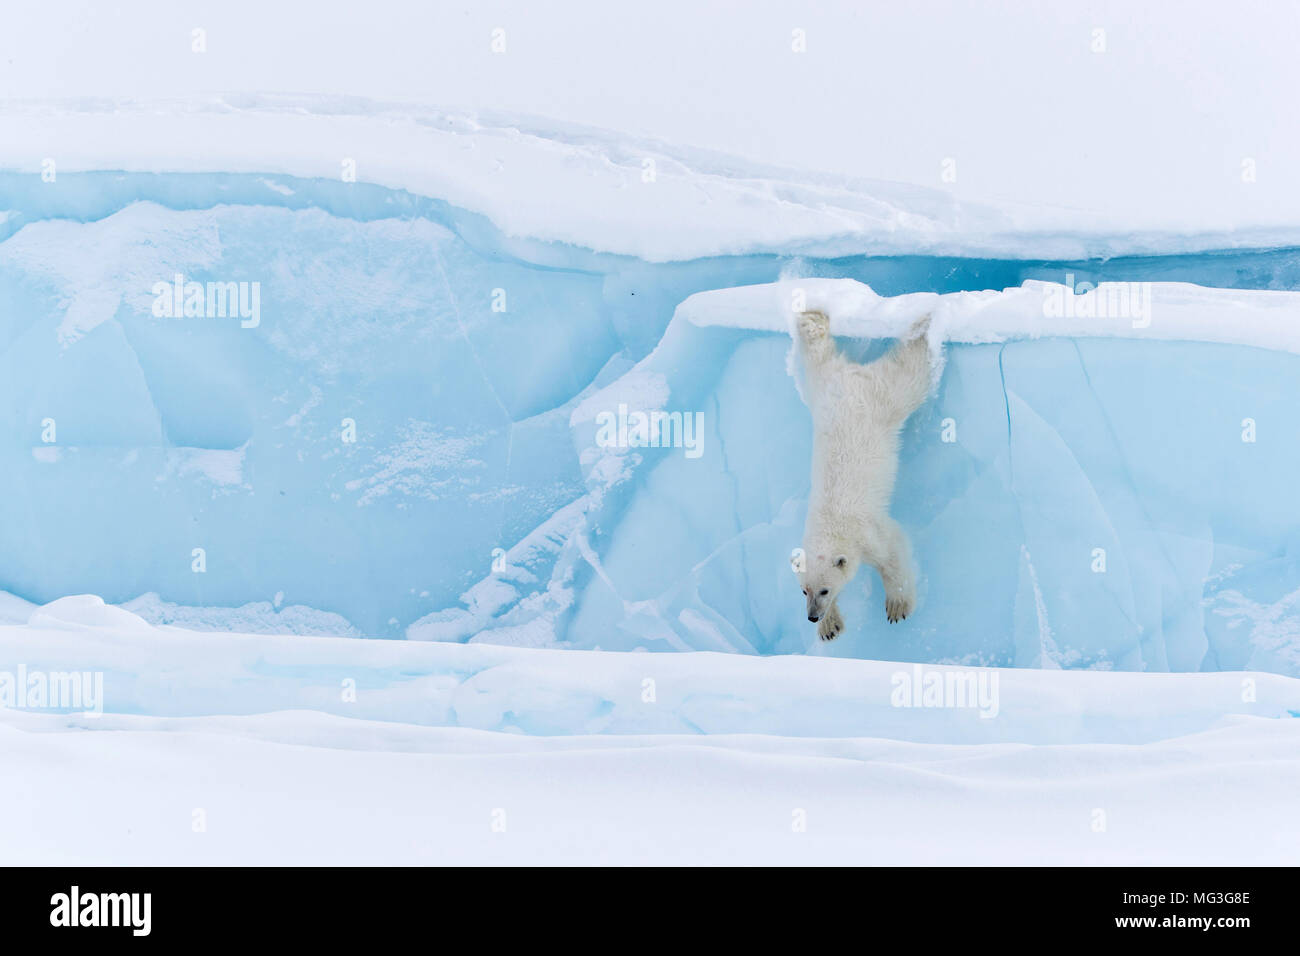 Juvenile, yearling, polar bear cub jumps off ege of iceberg.  Baffin Island, Canada, Nunavut, arctic - Stock Image